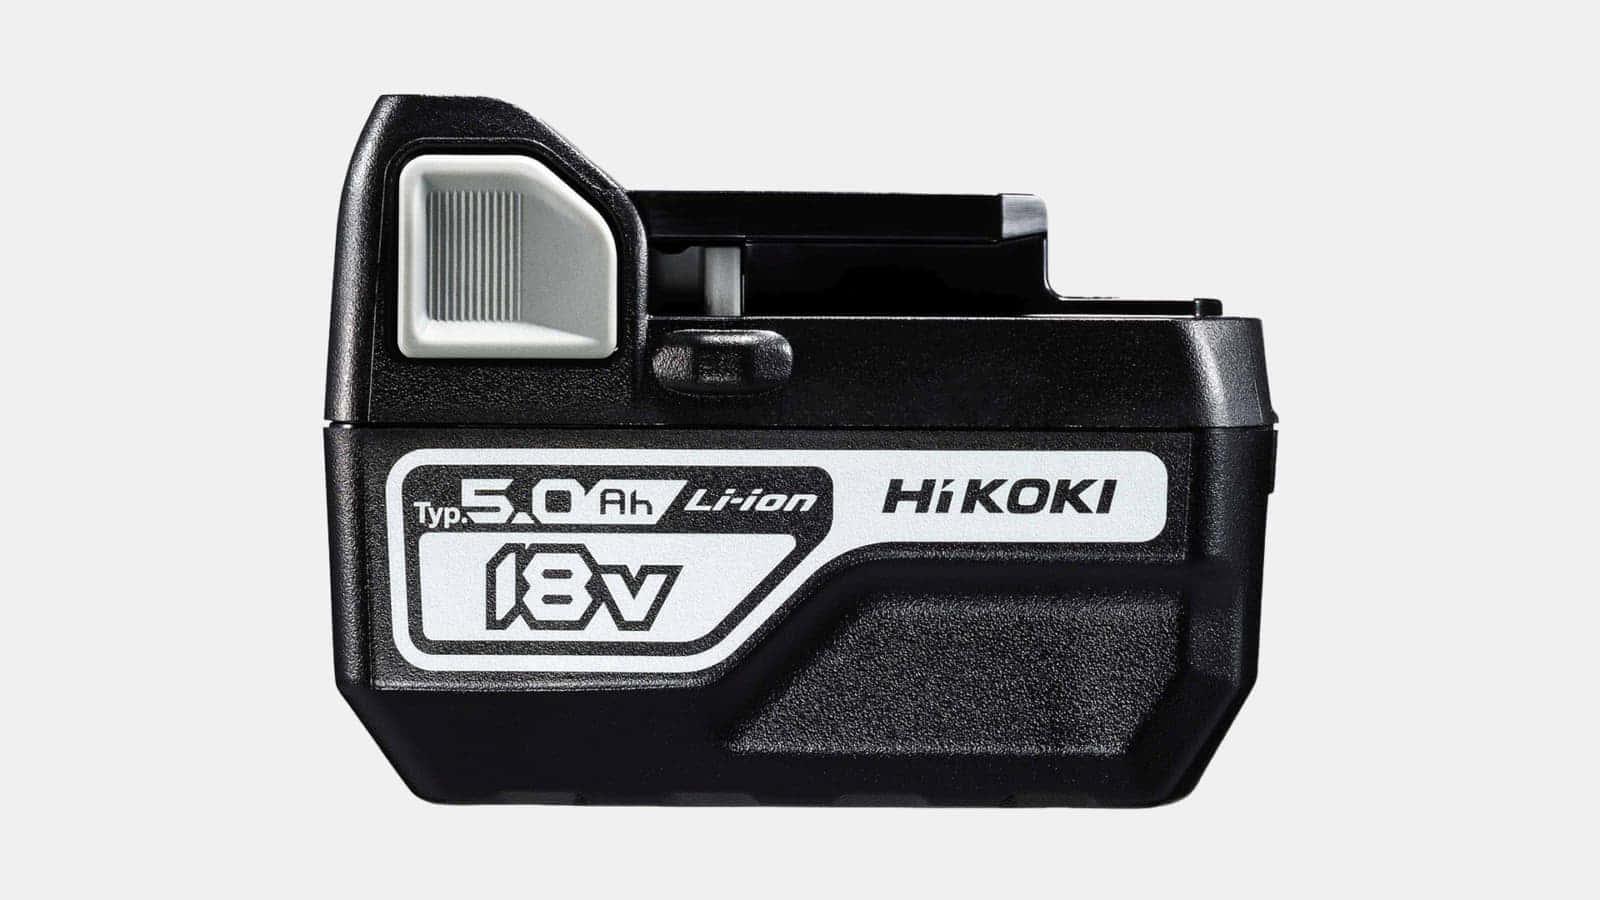 HiKOKI BSL1850C 新型のコンパクト18Vバッテリー